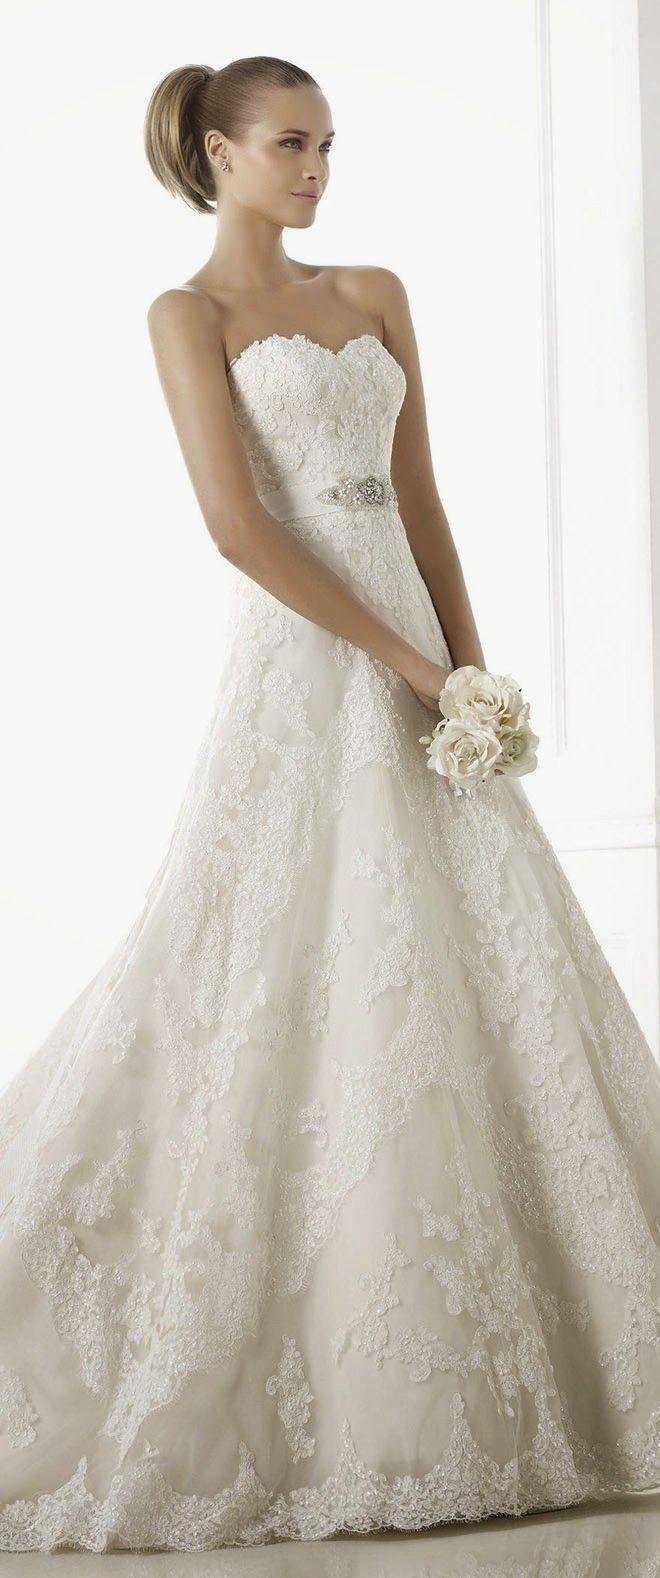 Pronovias Costura 2015 Bridal Collection   bellethemagazine.com